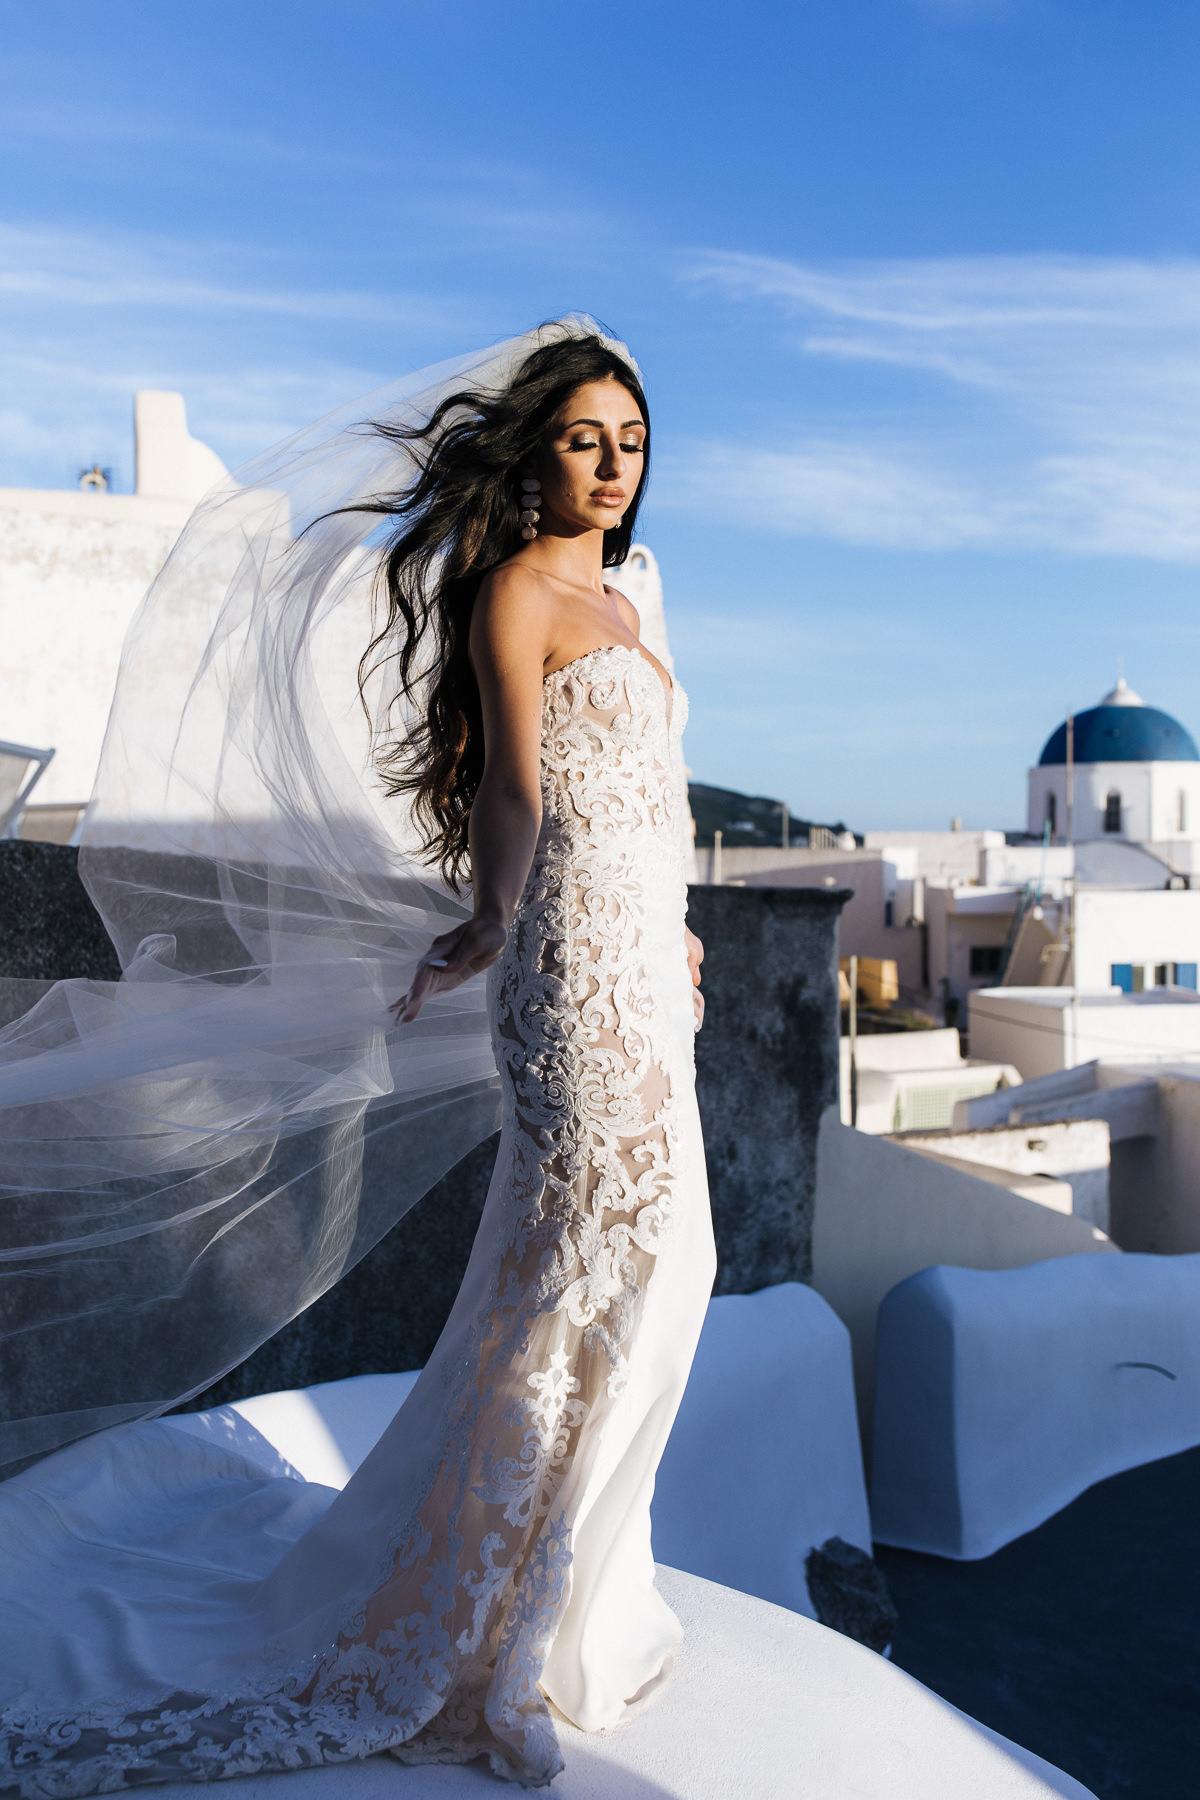 santorini elopement photo session locations